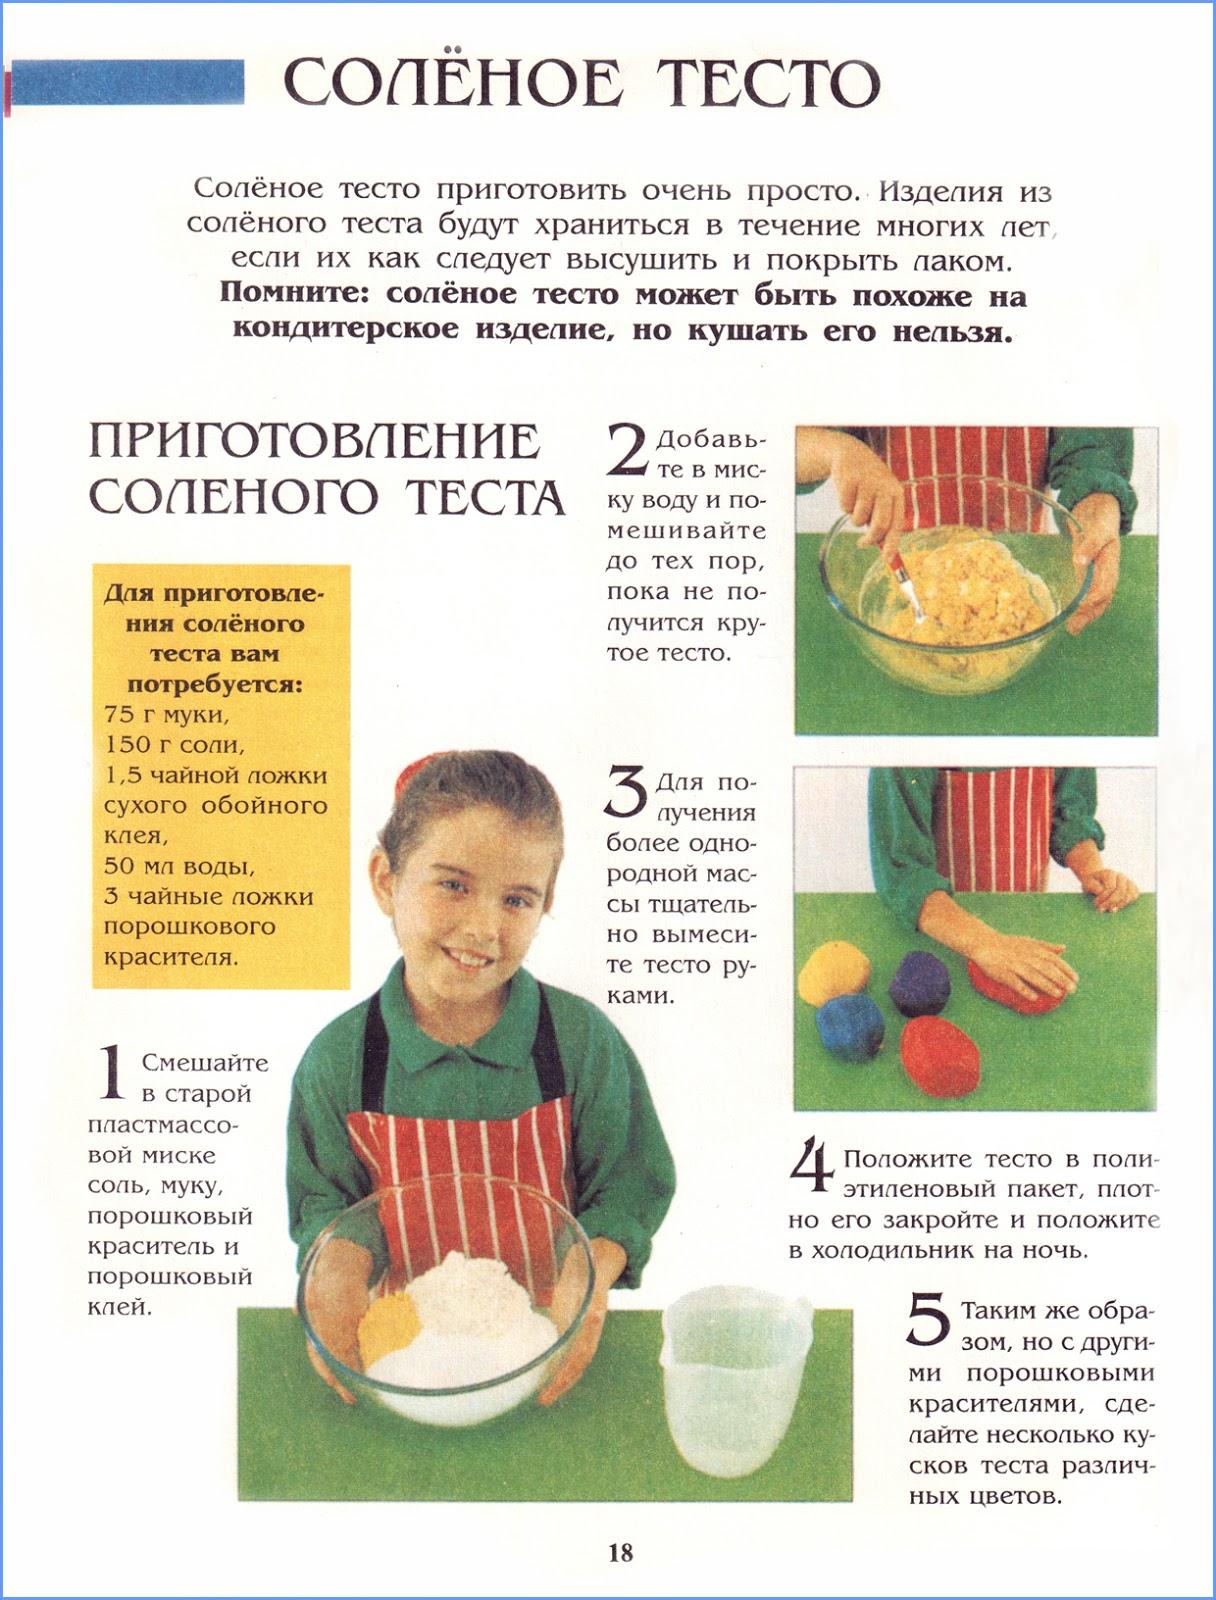 Соленое тесто для лепки. Рецепты для 53